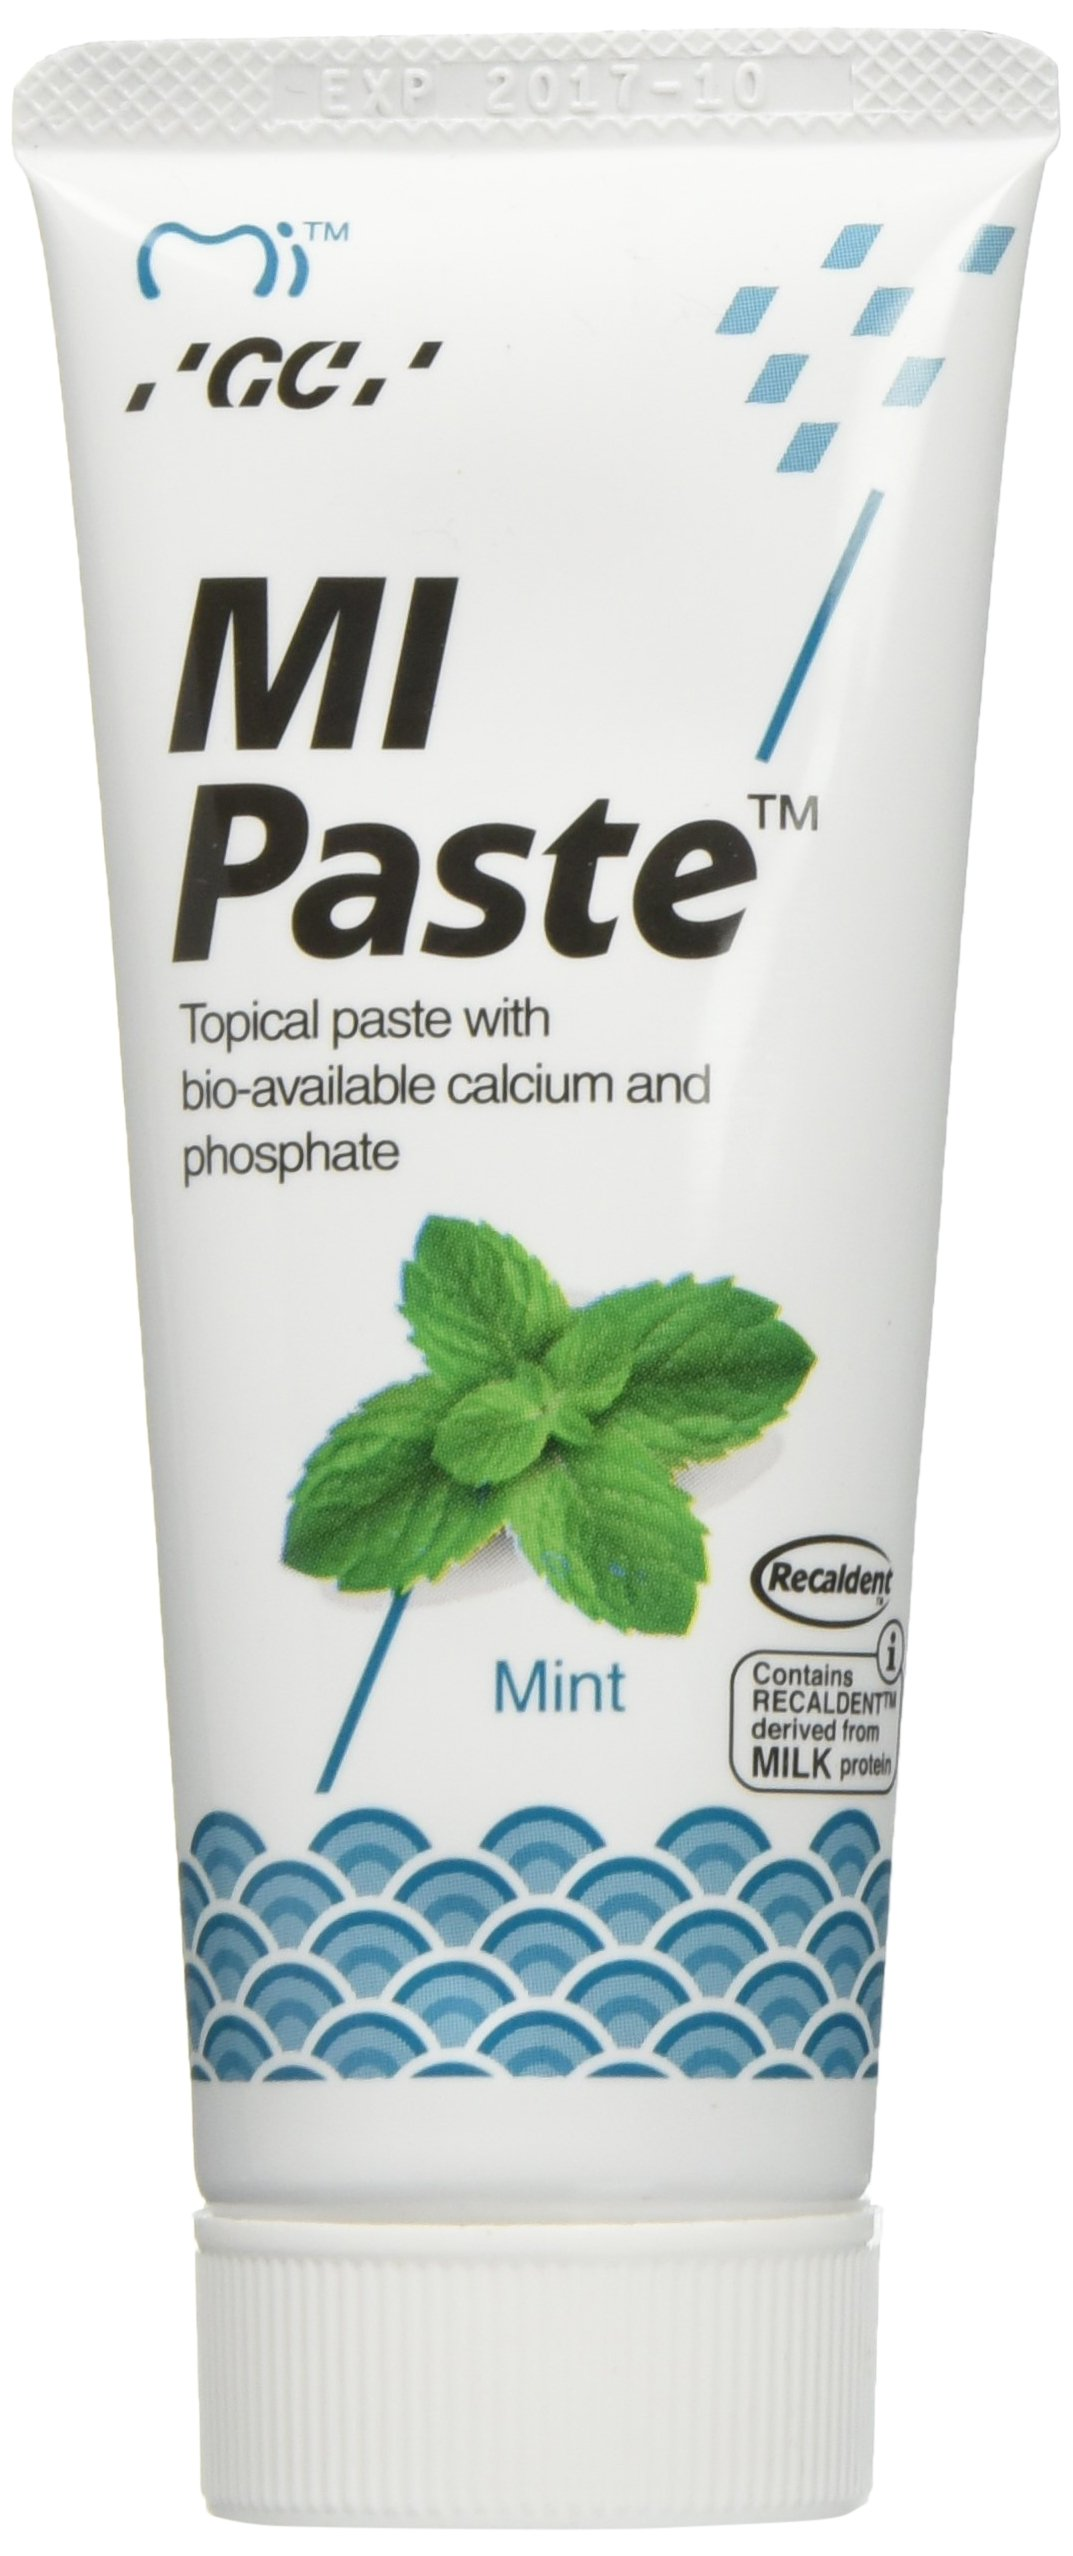 GC America 3679 Mi Paste, Mint (Pack of 10)